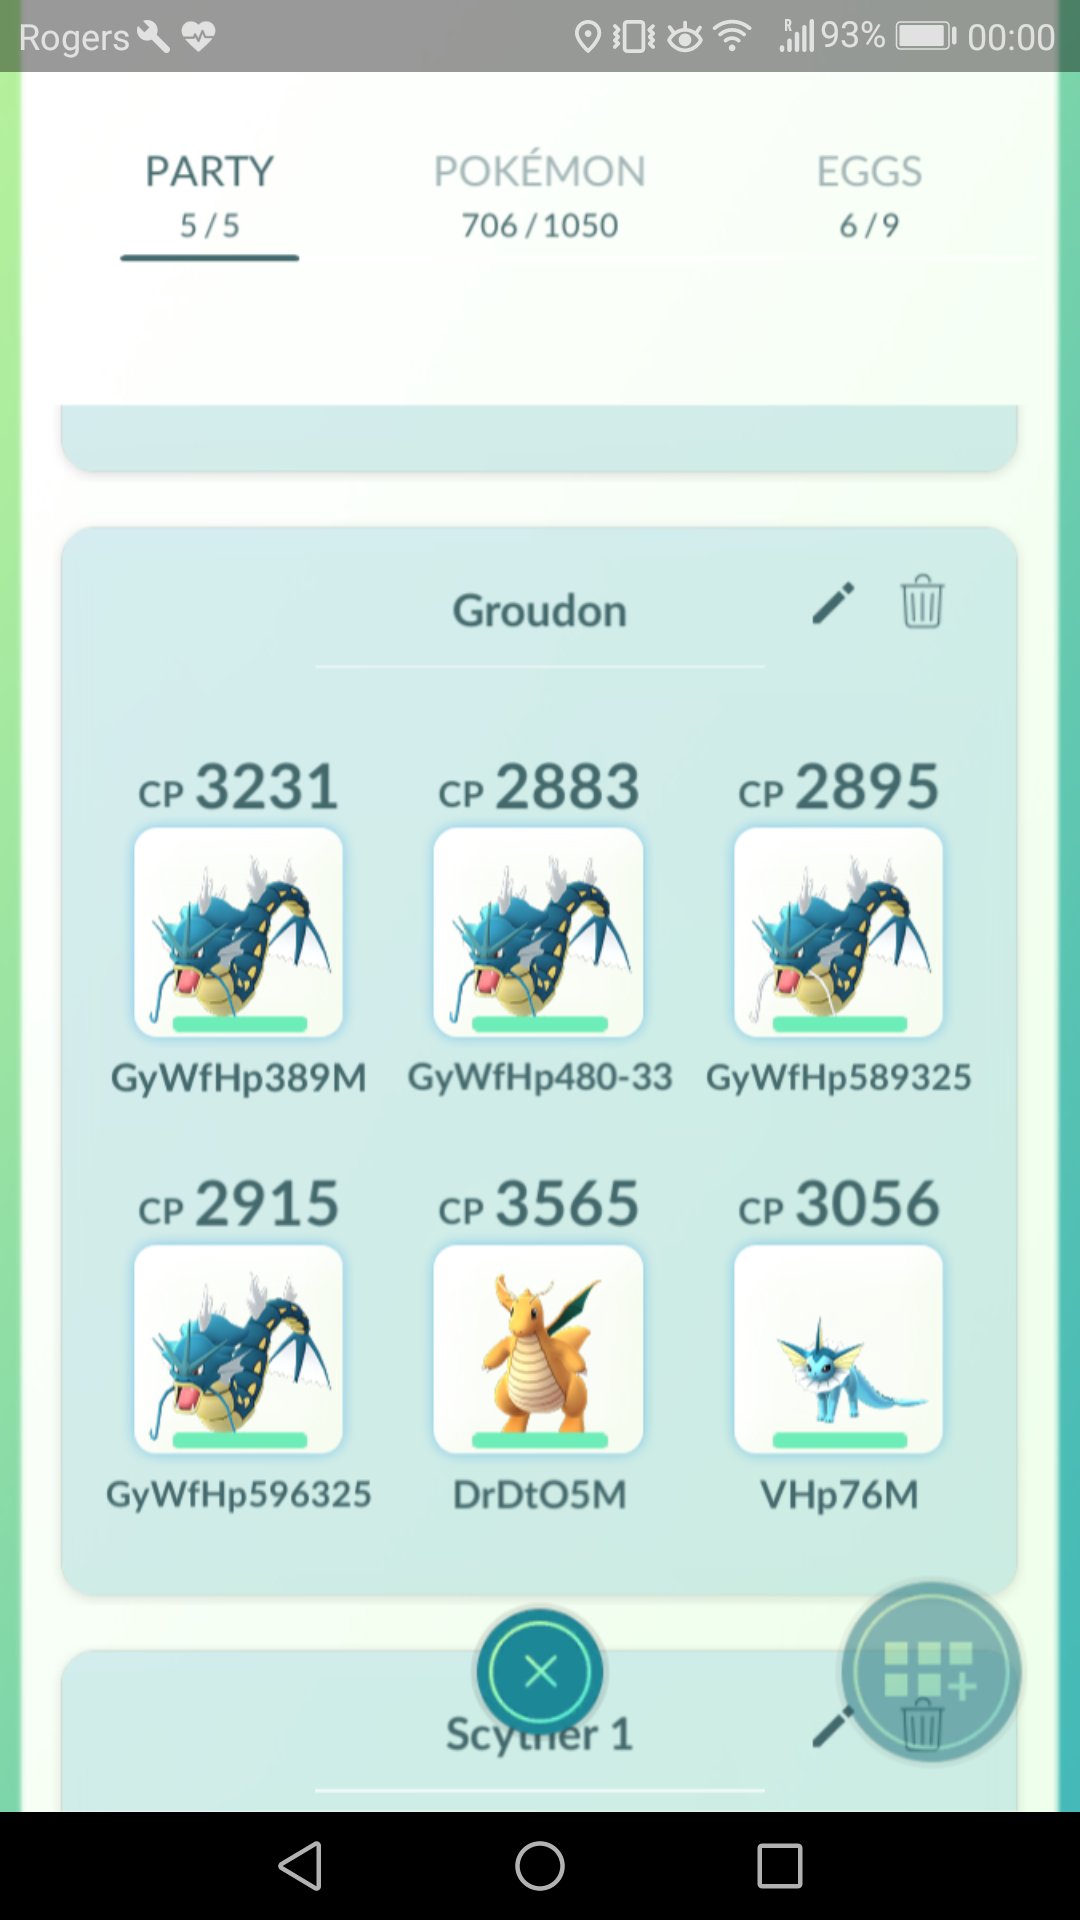 Spotted: Best Groudon Counter | Pokemon GO Wiki - GamePress